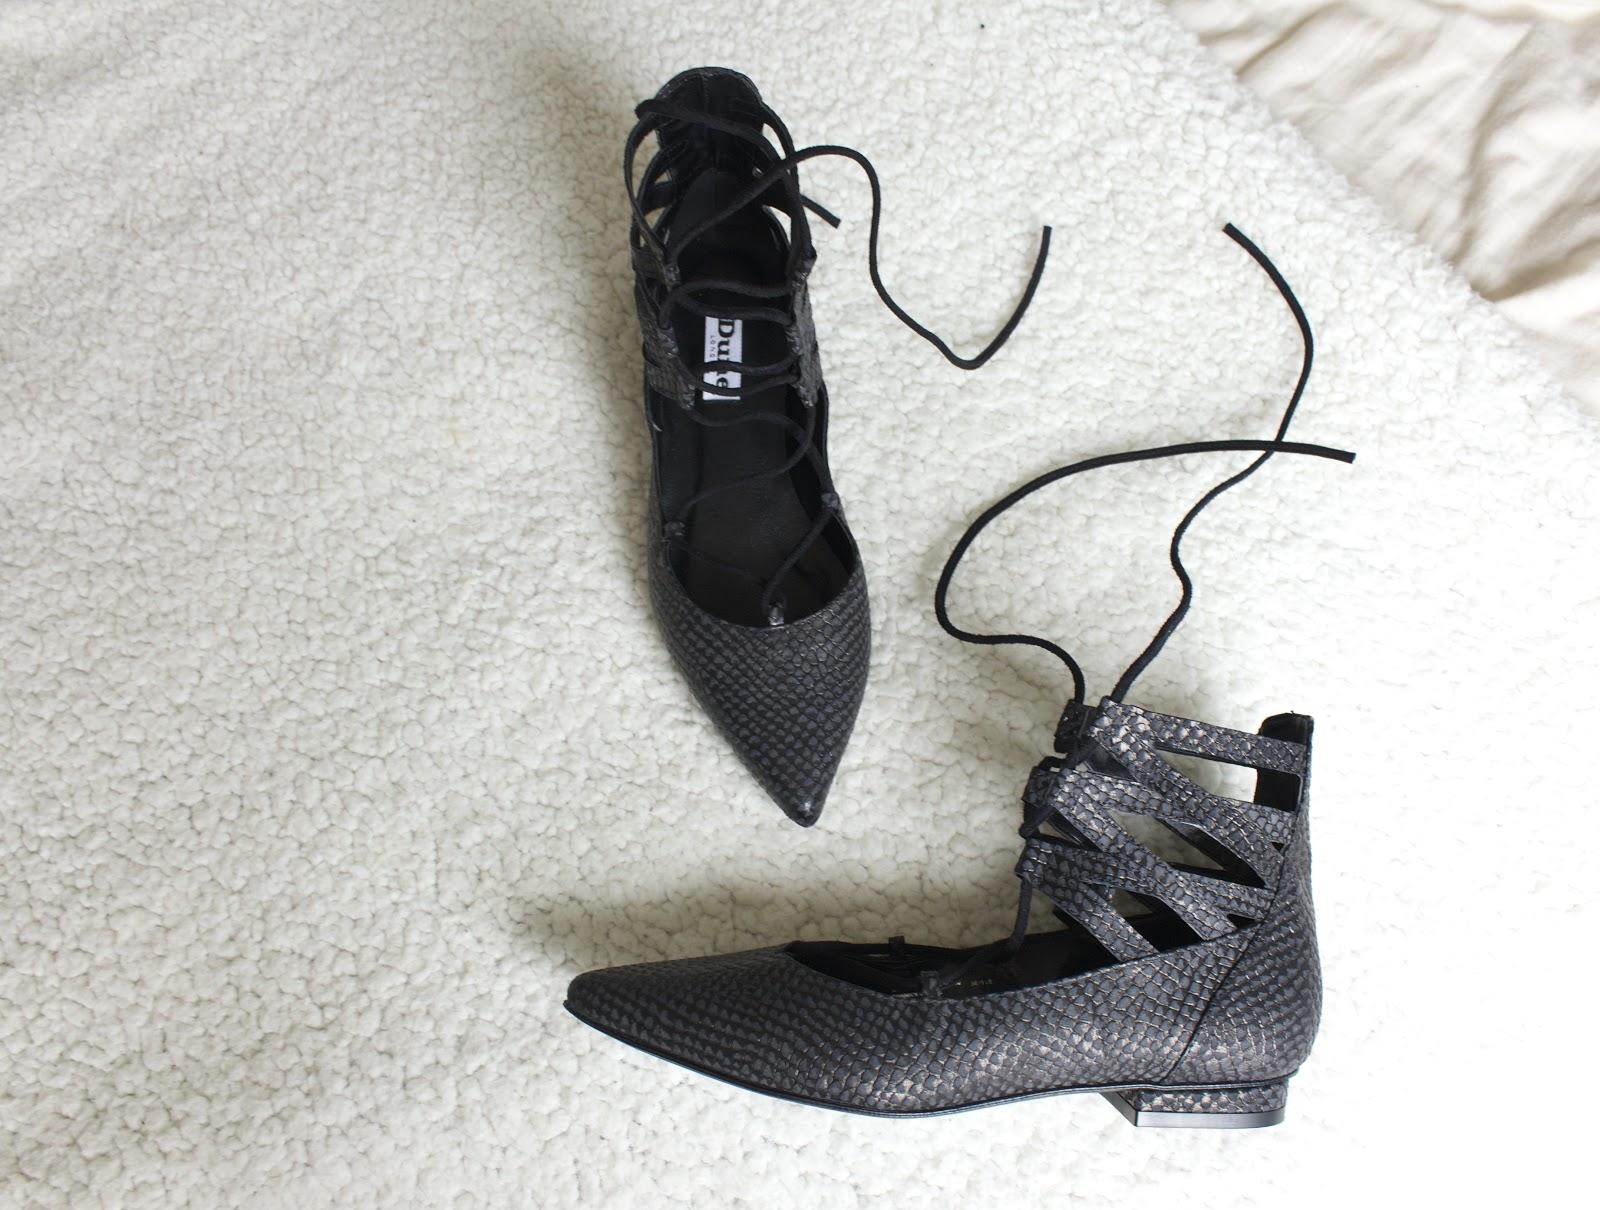 ballerina flats, reptile print shoes, dune london, leather flats, hobra flats,